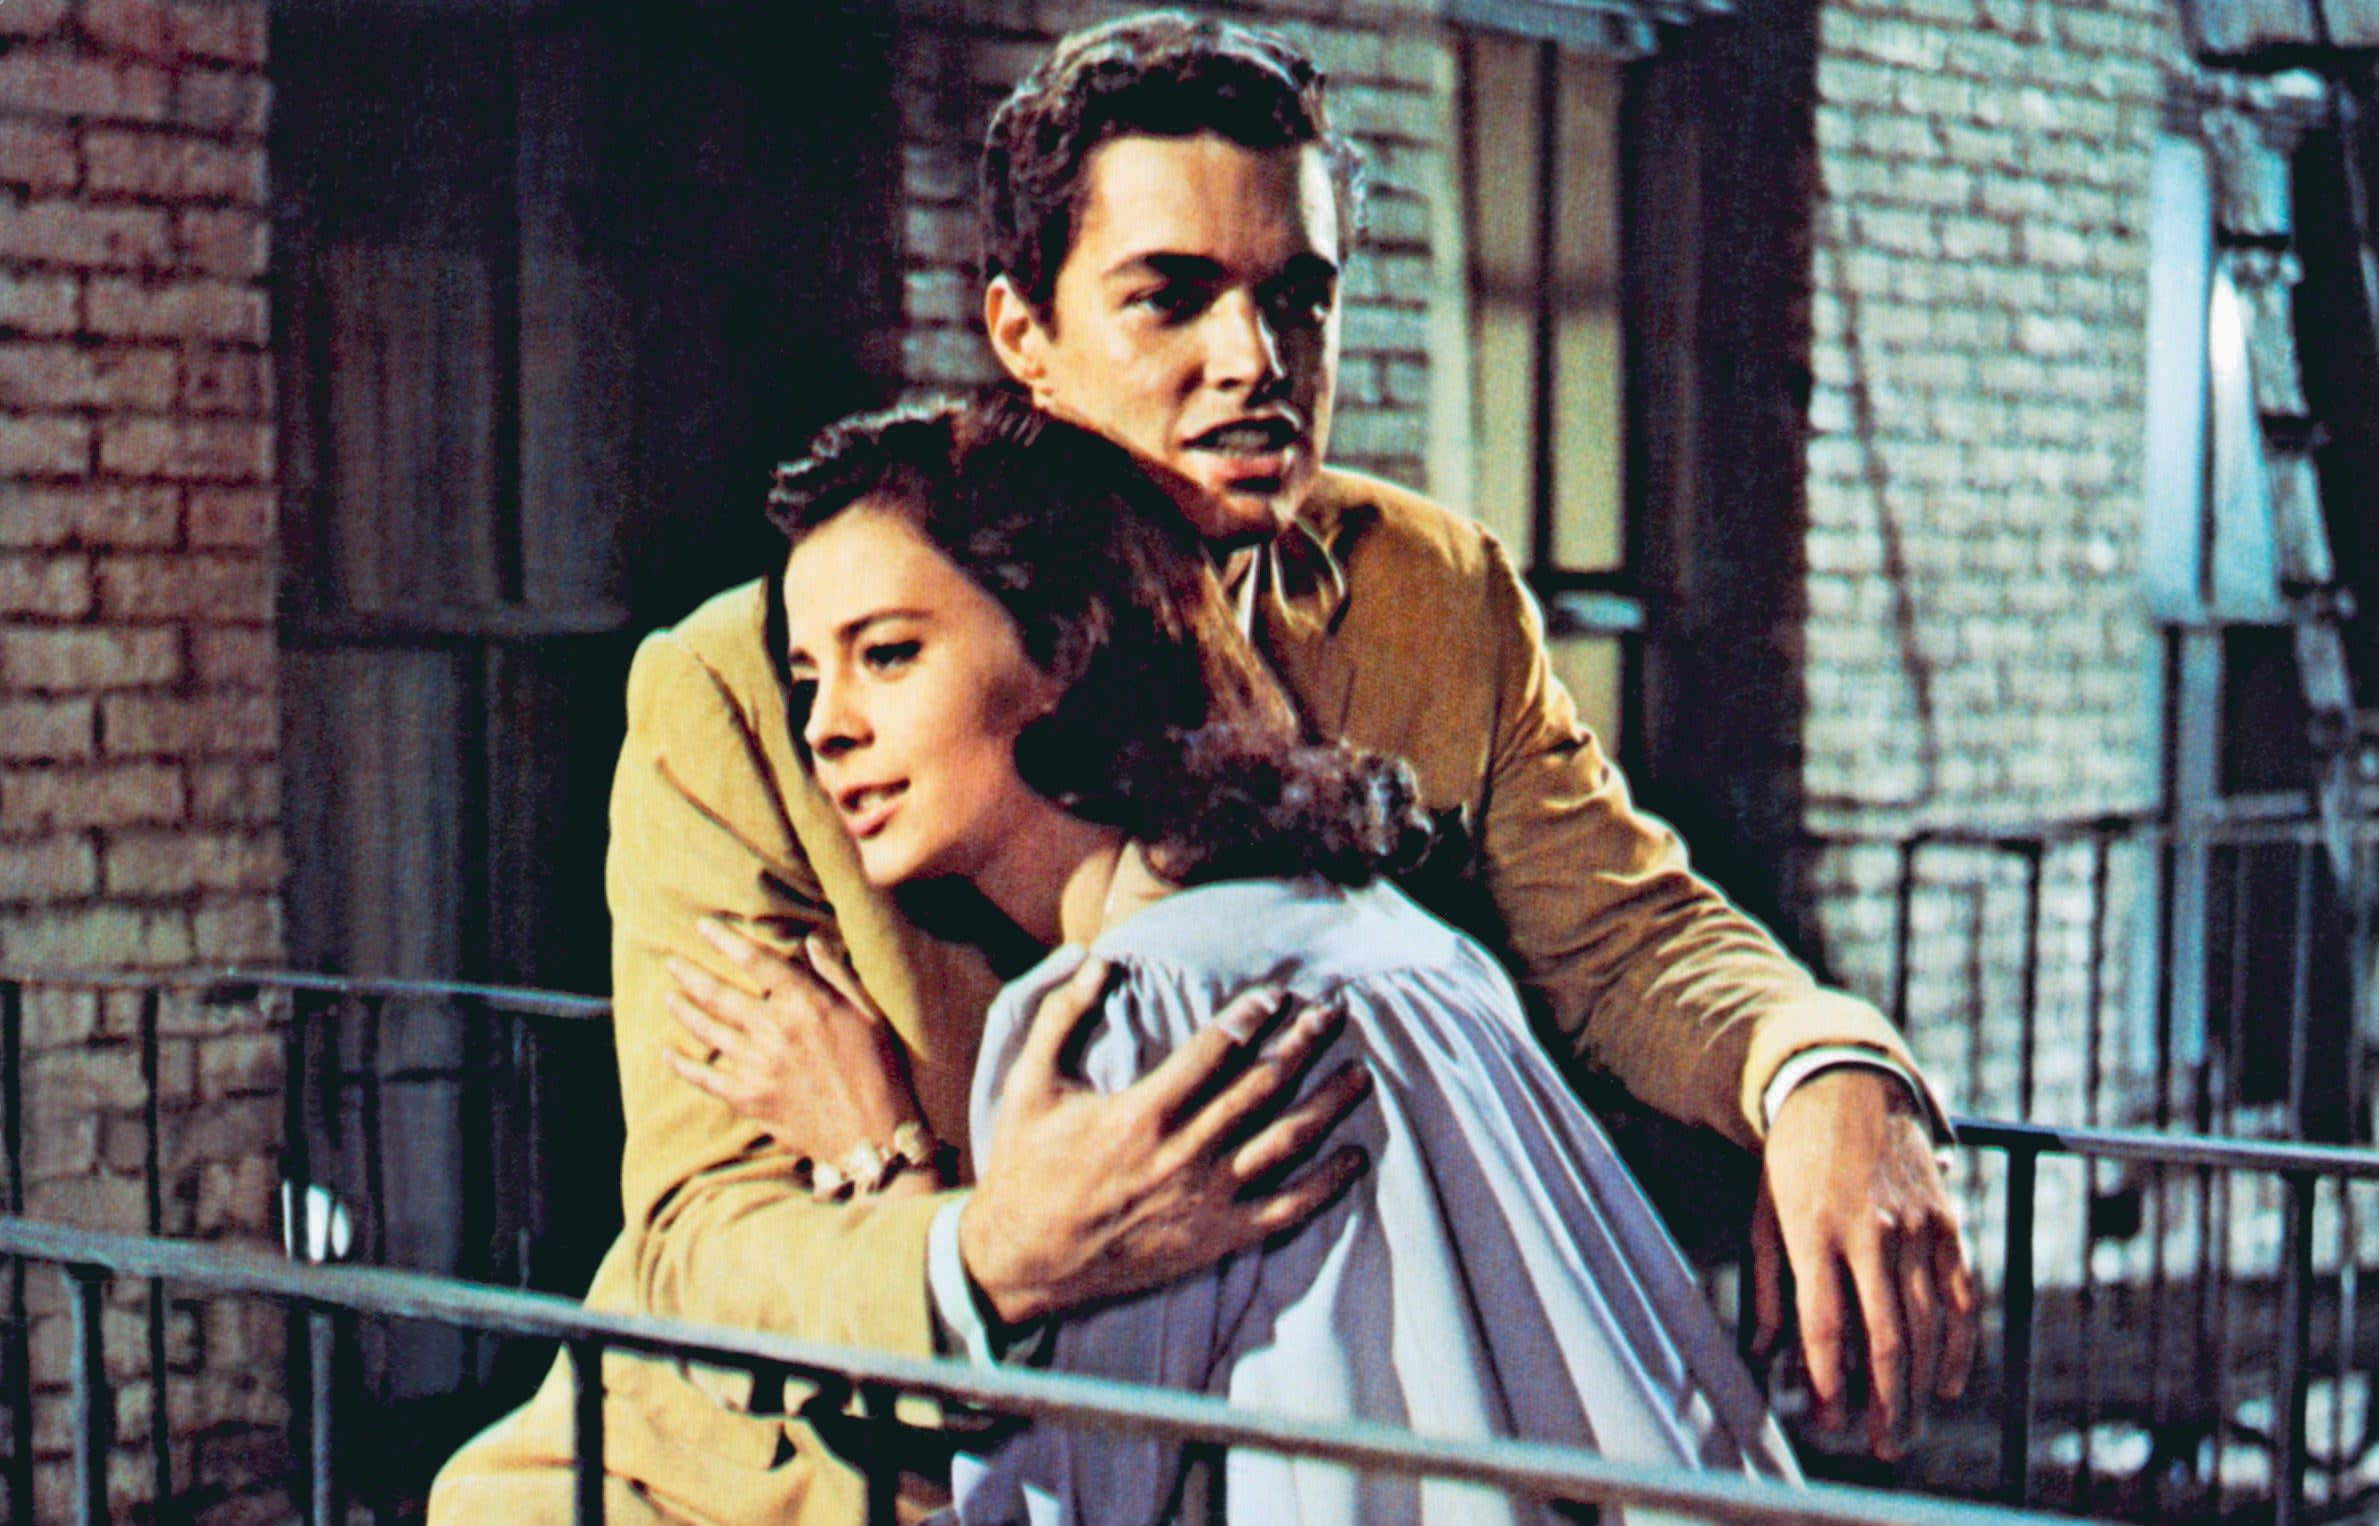 Natalie Wood as Maria in West Side Story hugging Tony.